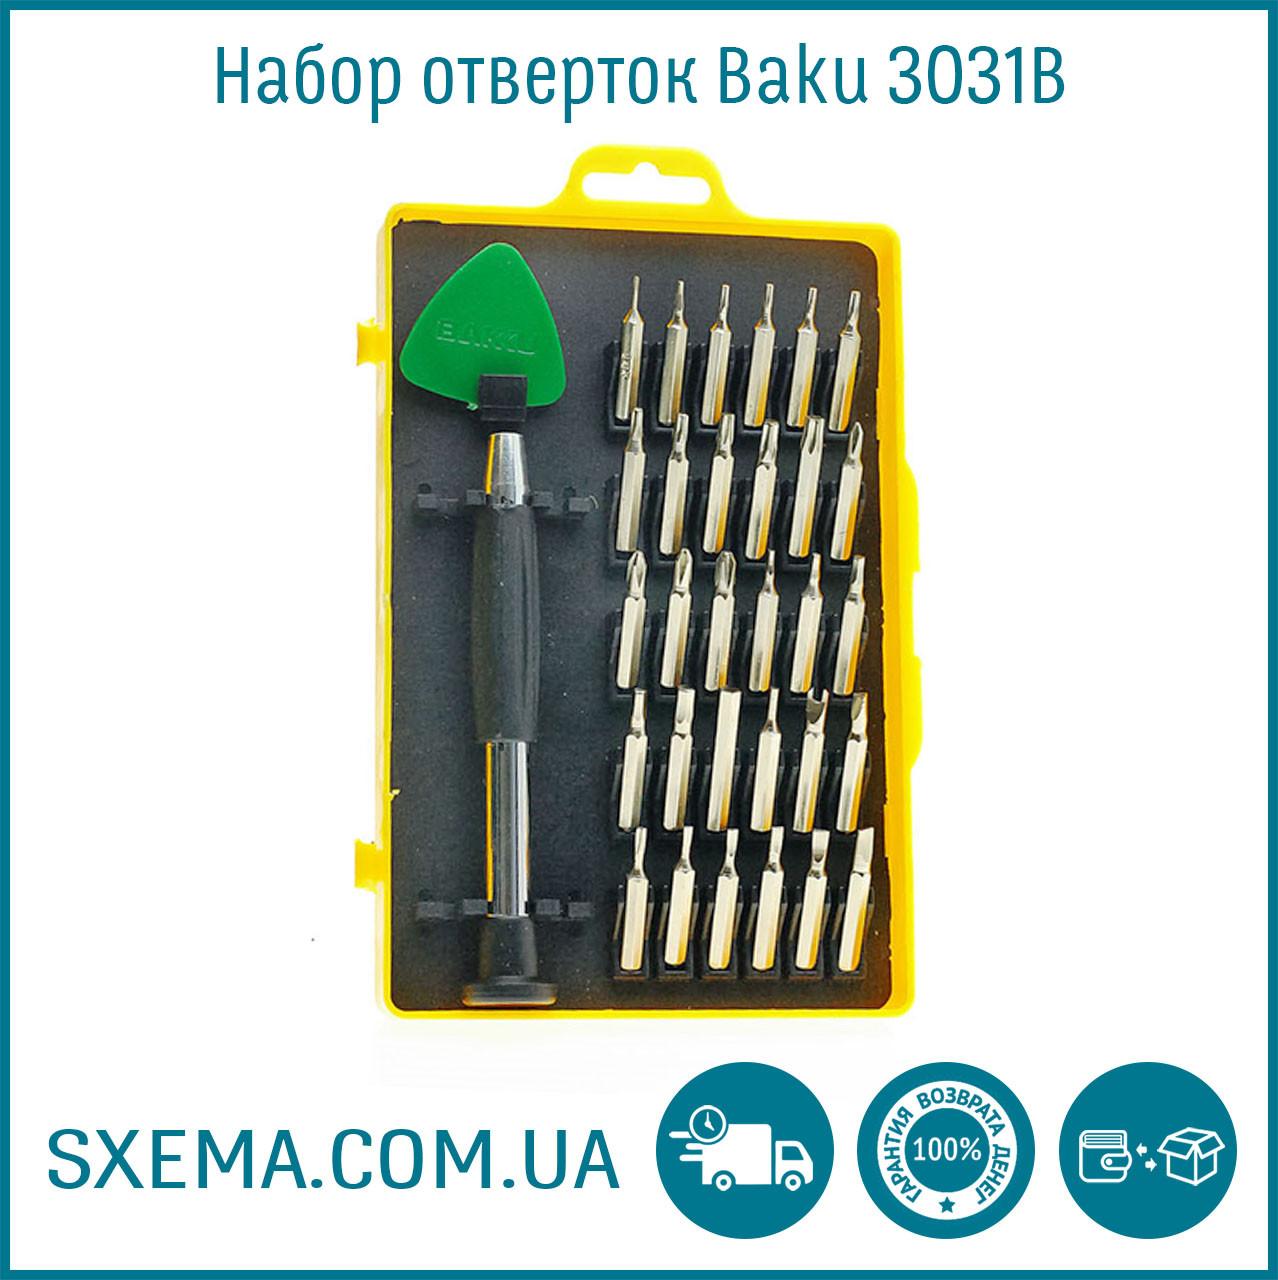 Набор отверток Baku 3031B